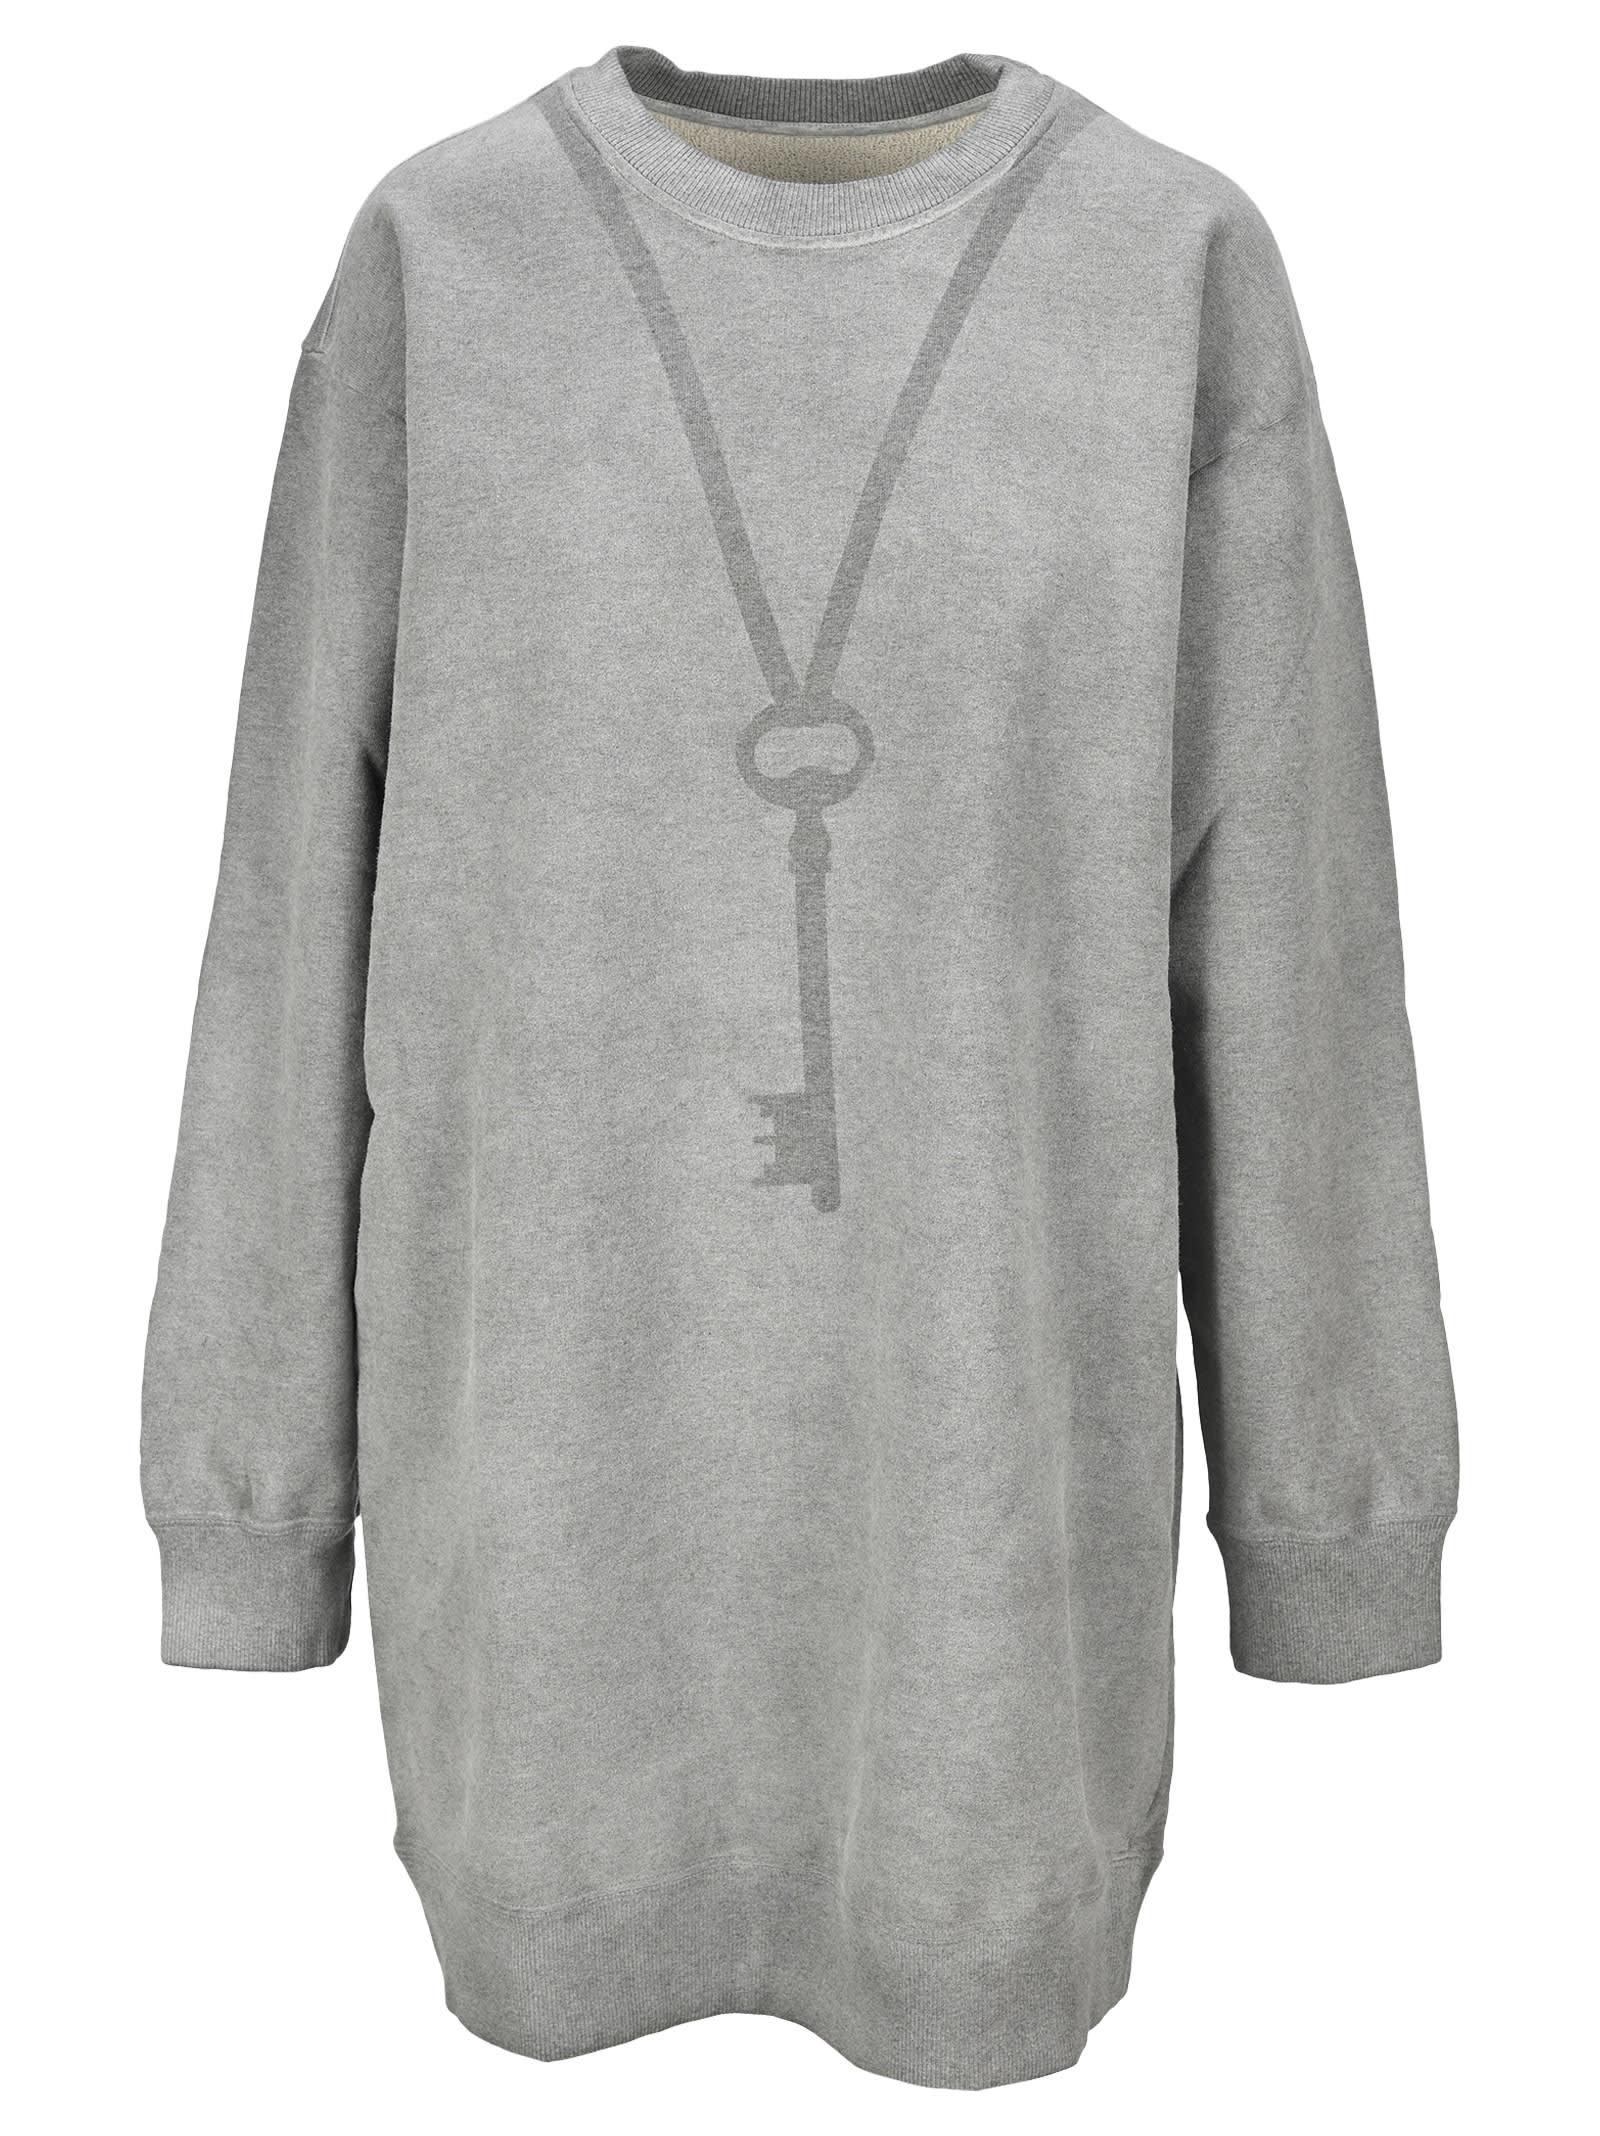 Mm6 Key Print Oversize Sweatshirt